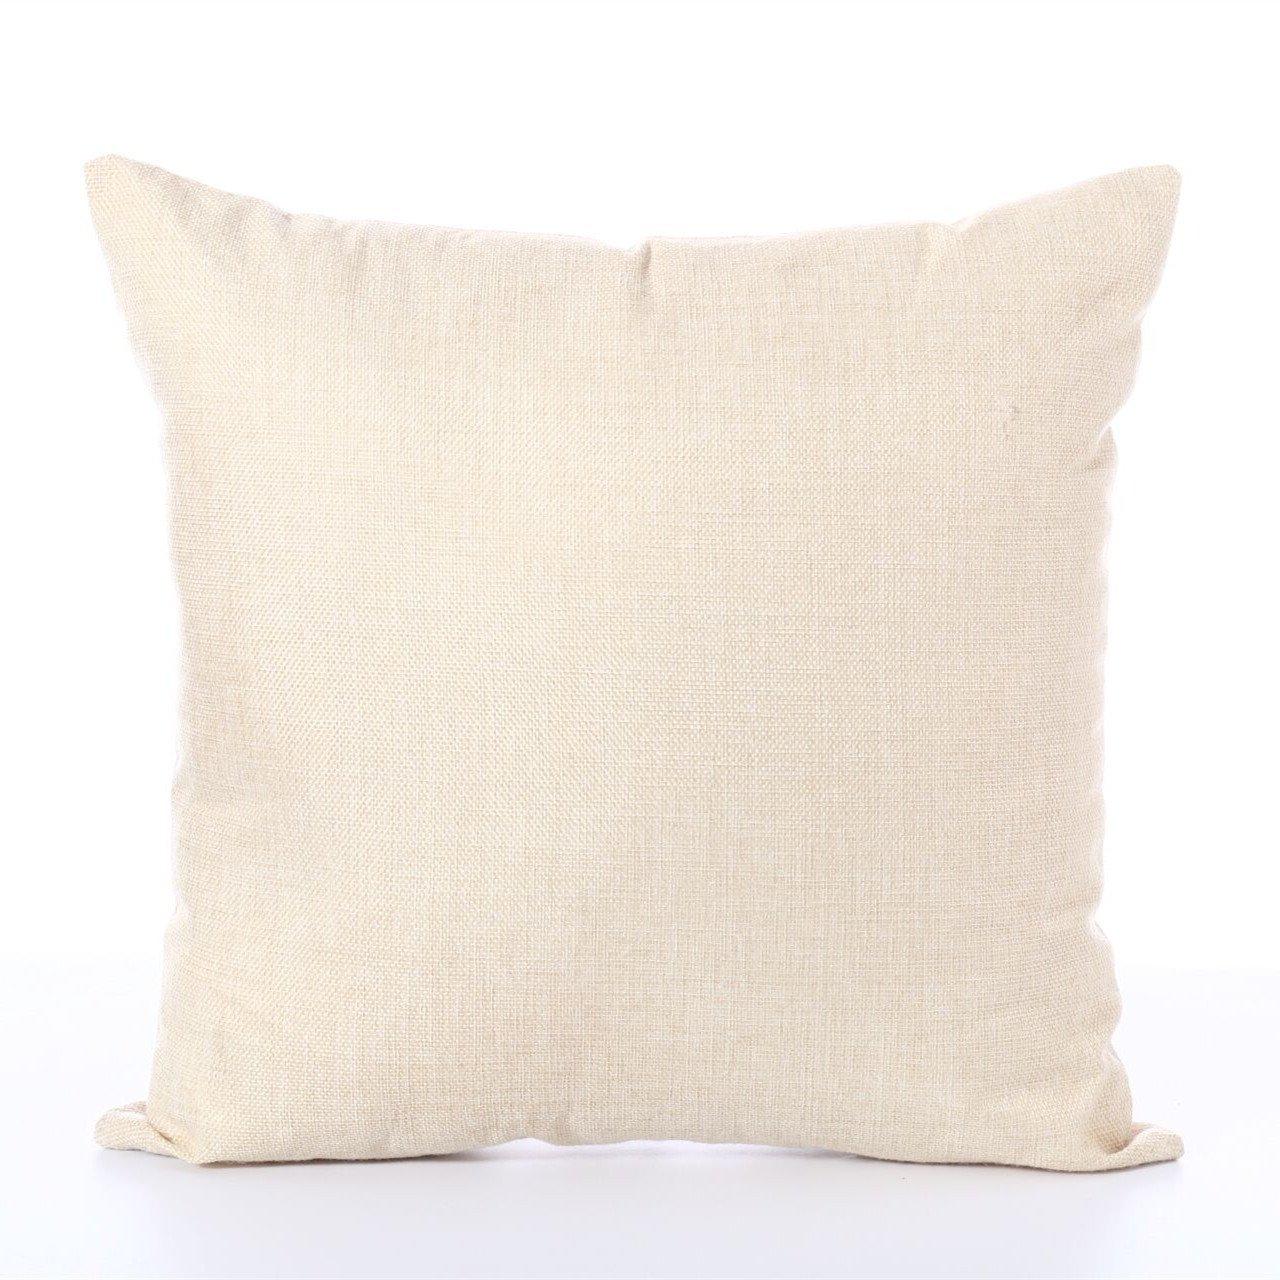 dodola Decorative Throw Pillow Covers Buddha Bamboo Cotton Linen Cushion Covers for Spa Meditation Yoga Room Decor 4Pcs